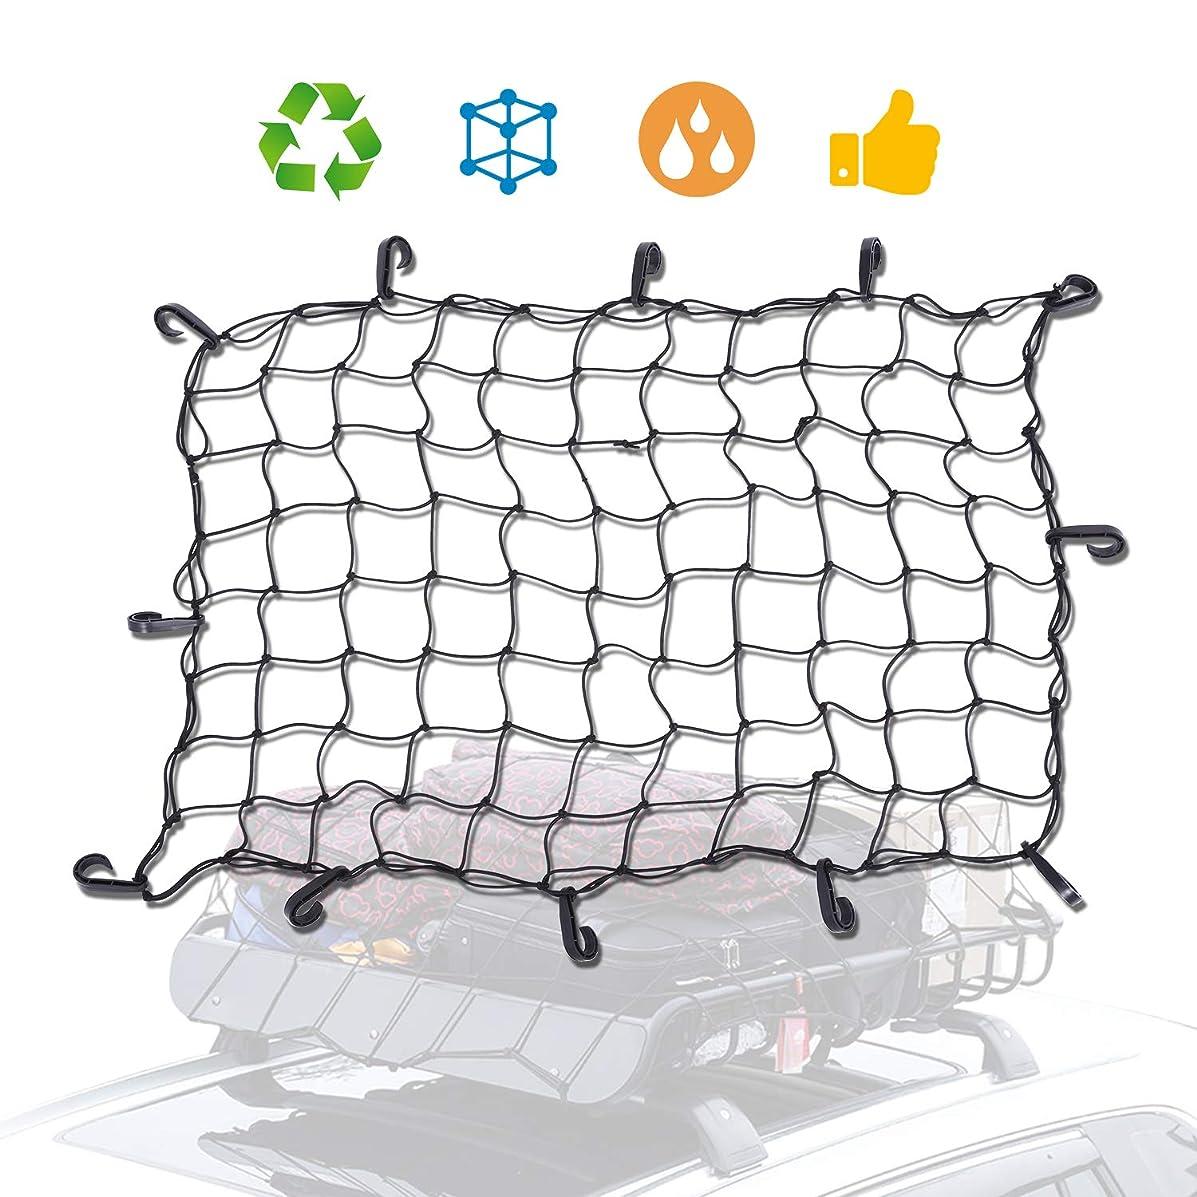 COOCHEER 120x90cm Cargo Net, Large Universal Nylon net Large Capacity 12 Hooks Roof Luggage net Car Trunk net Pocket Stretches Mesh Net for Cars